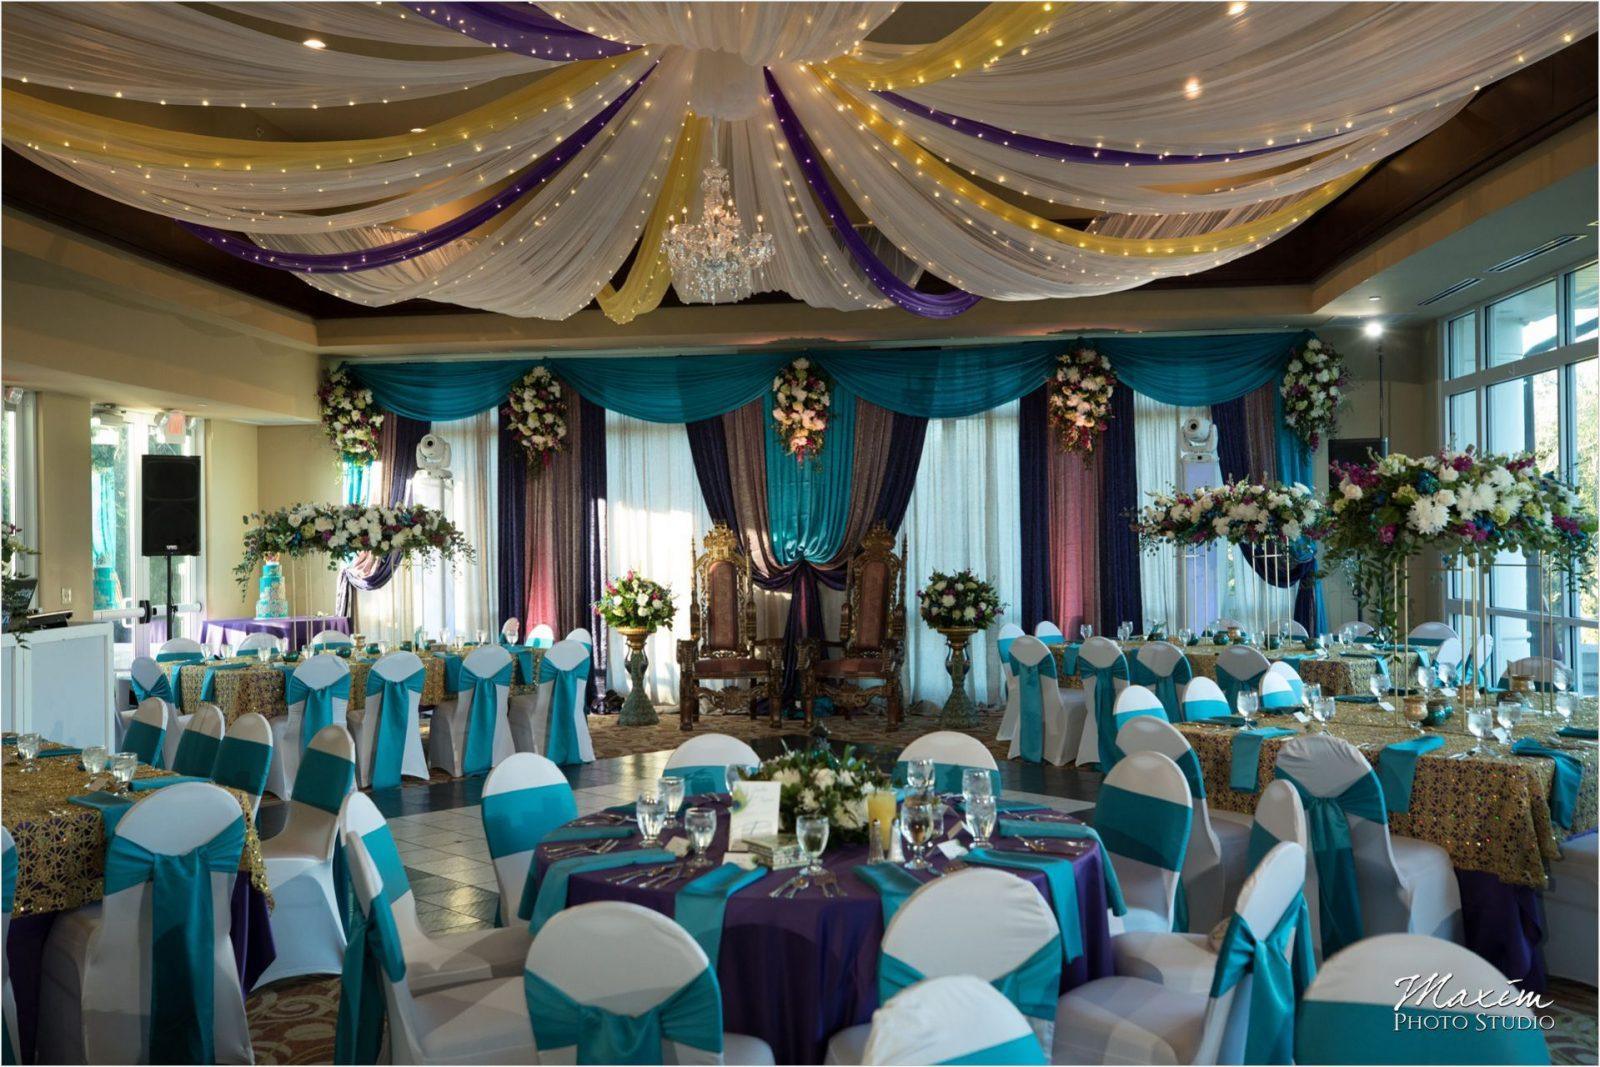 Floral V Designs Hindu Wedding Flowers